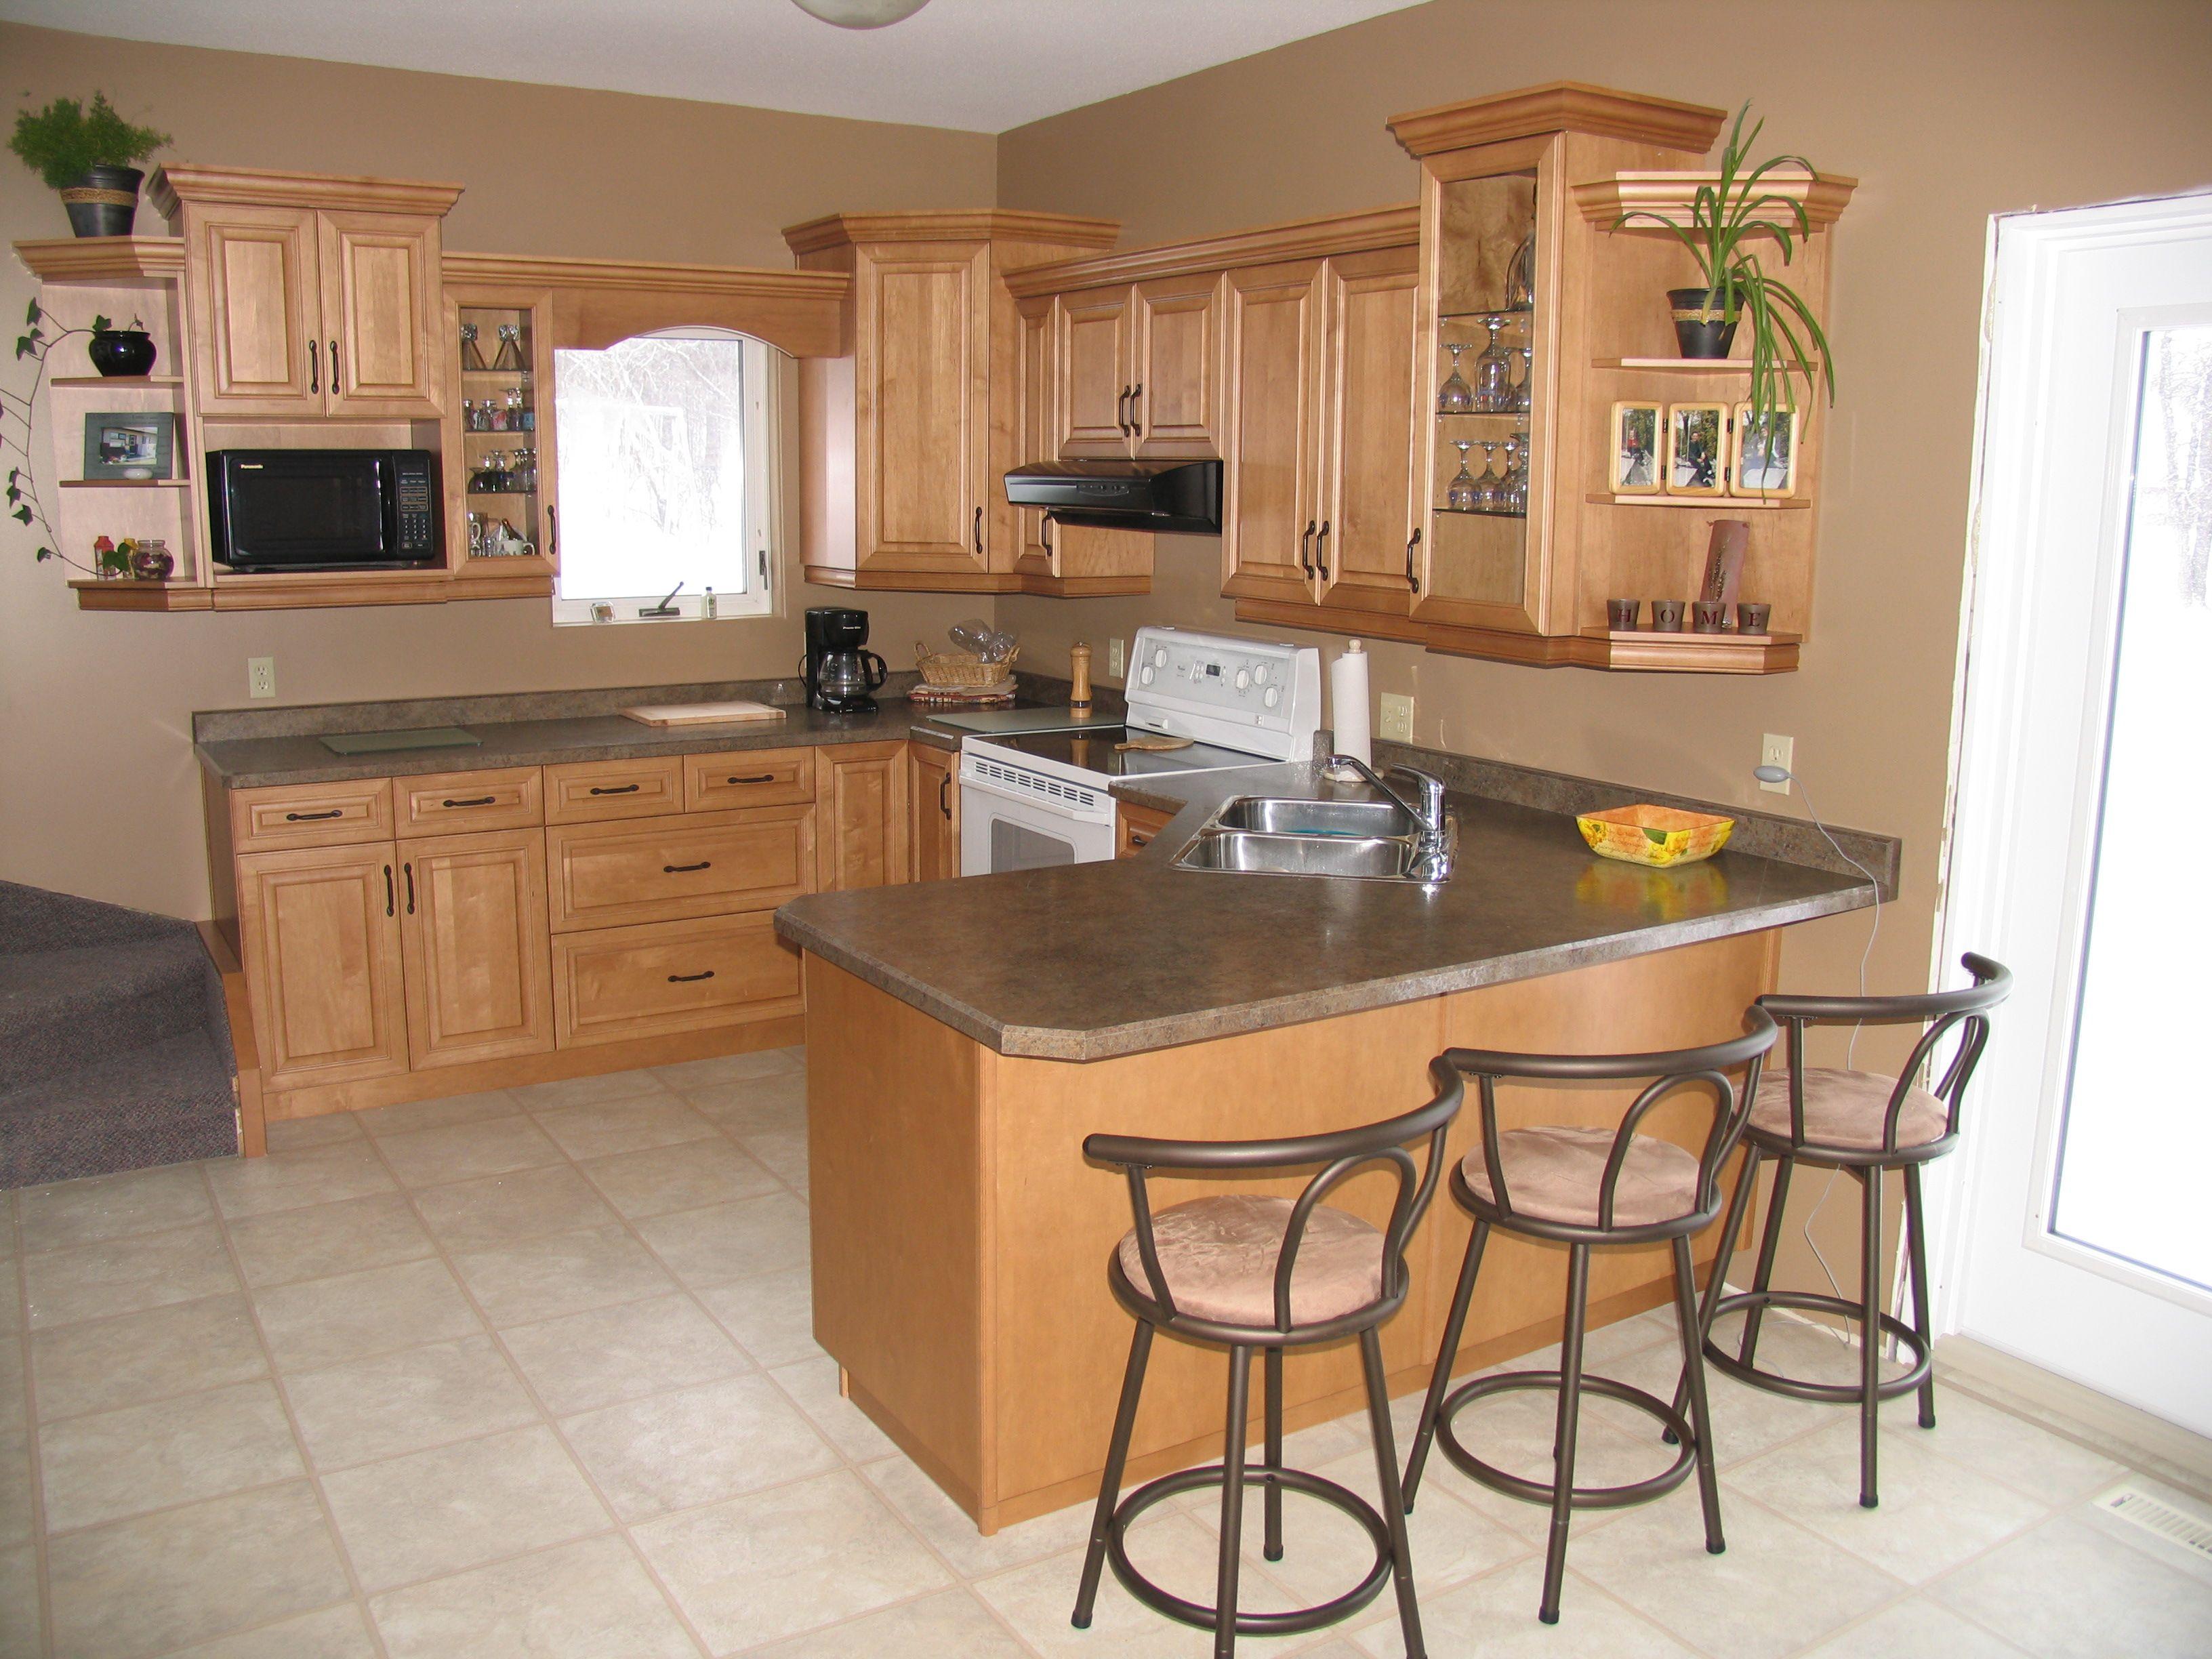 Cabinets: Maple   Wheatfield / Countertops: Wilsonart Laminate   Deepstar  Agate